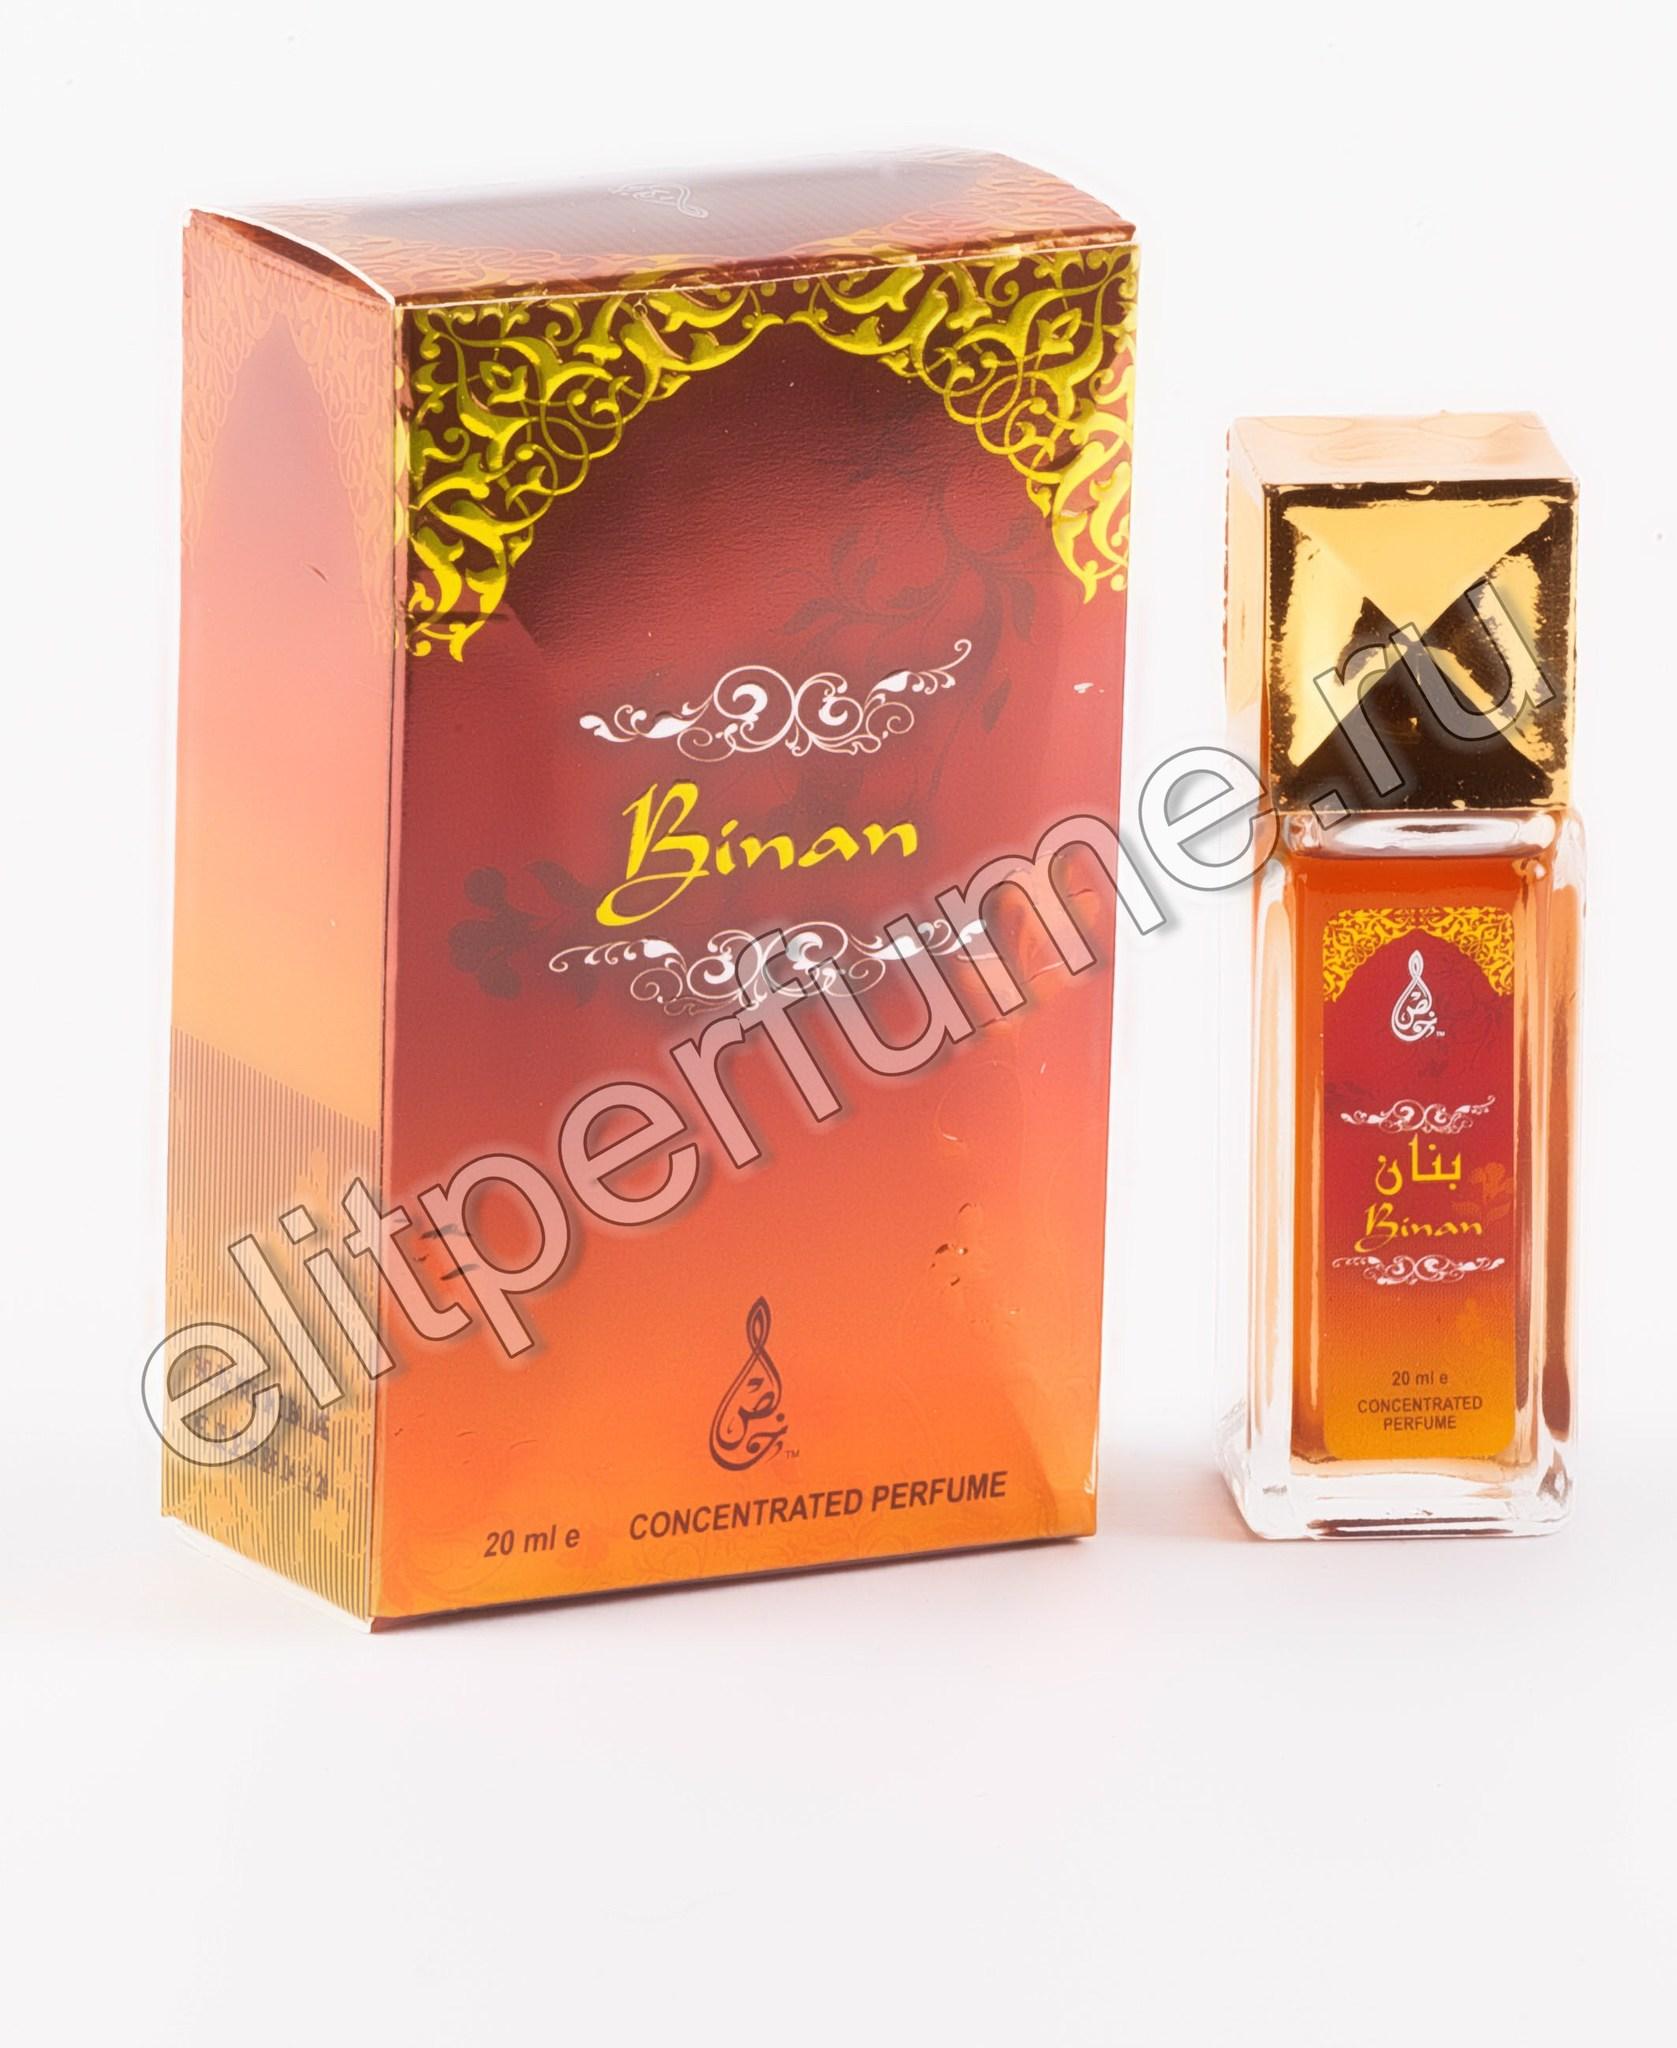 Binan Бинан 20 мл арабские масляные духи от Халис Khalis Perfumes